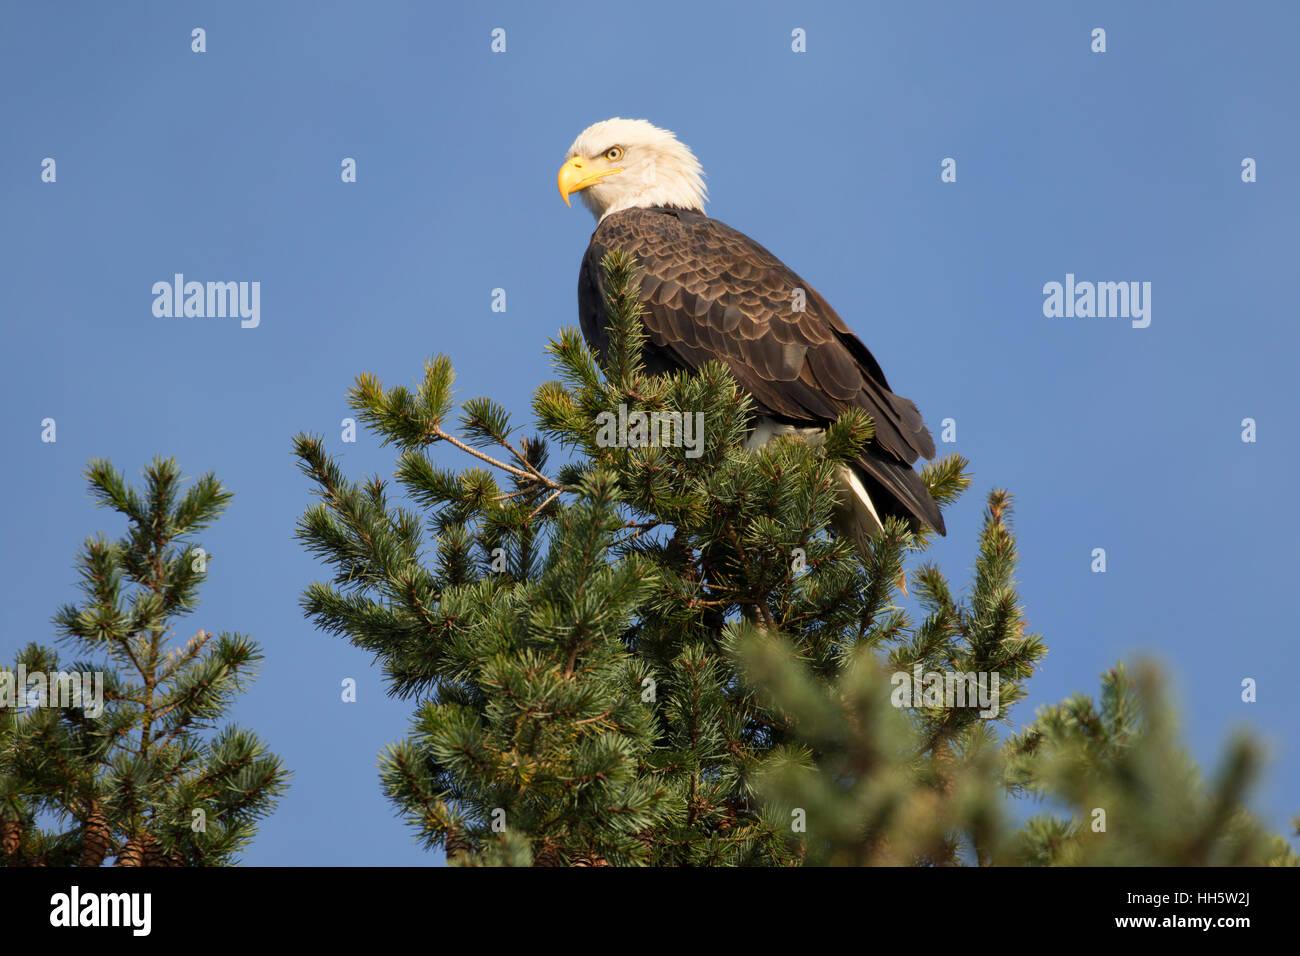 Bald eagle, George C Reifel Migratory Bird Sanctuary, British Columbia, Canada - Stock Image